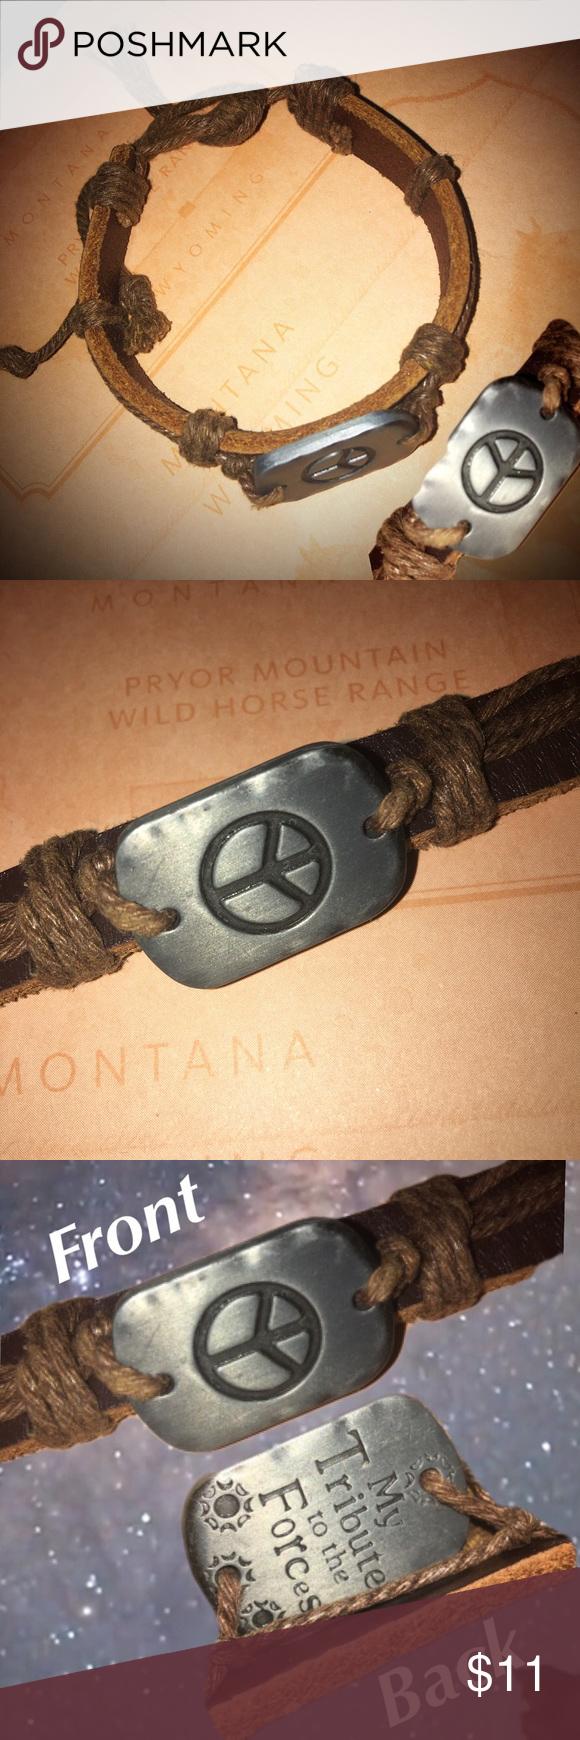 Genuine Leather Rope Peace Sign Bracelet Peace Sign Bracelet Genuine Leather Hinged Bangle